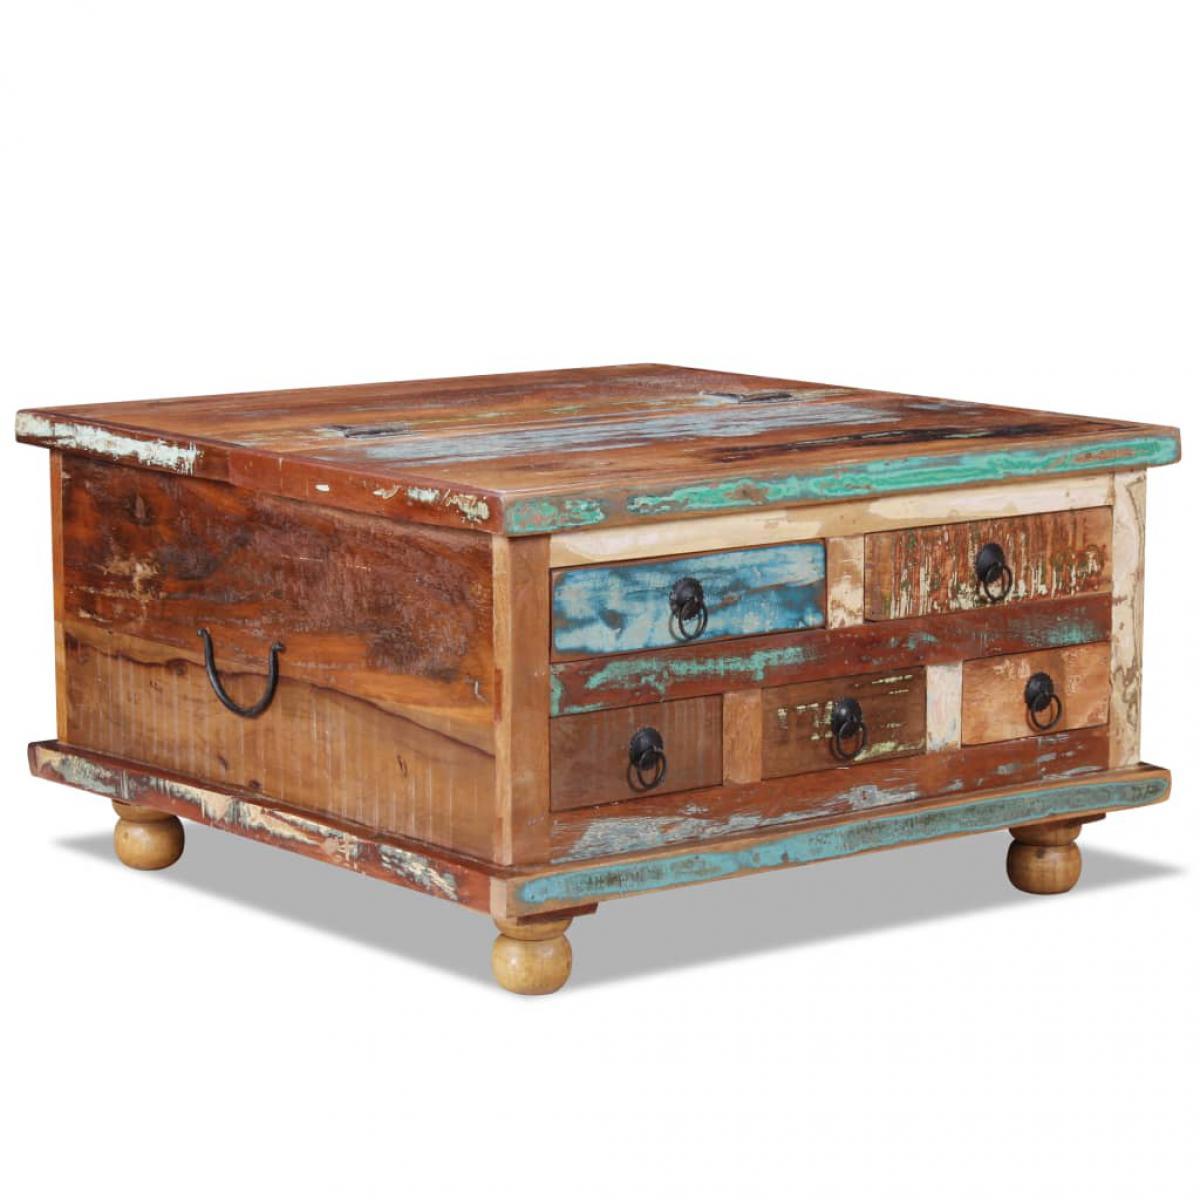 Chunhelife Table basse Bois de récupération 70 x 70 x 38 cm